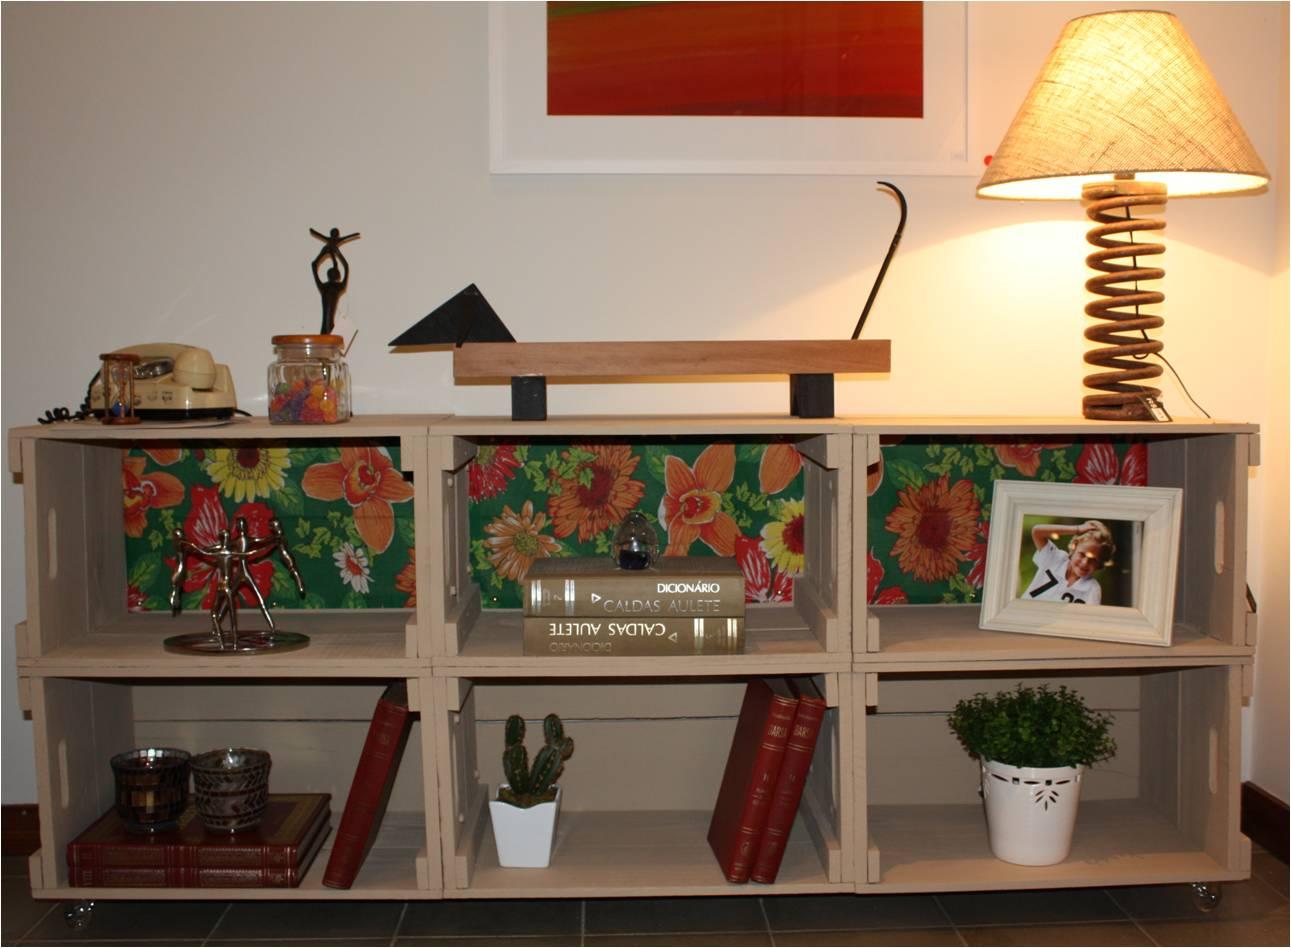 Arquiteta Thati Struckel: Reciclar e decorar caixotes de feira #C67605 1291x948